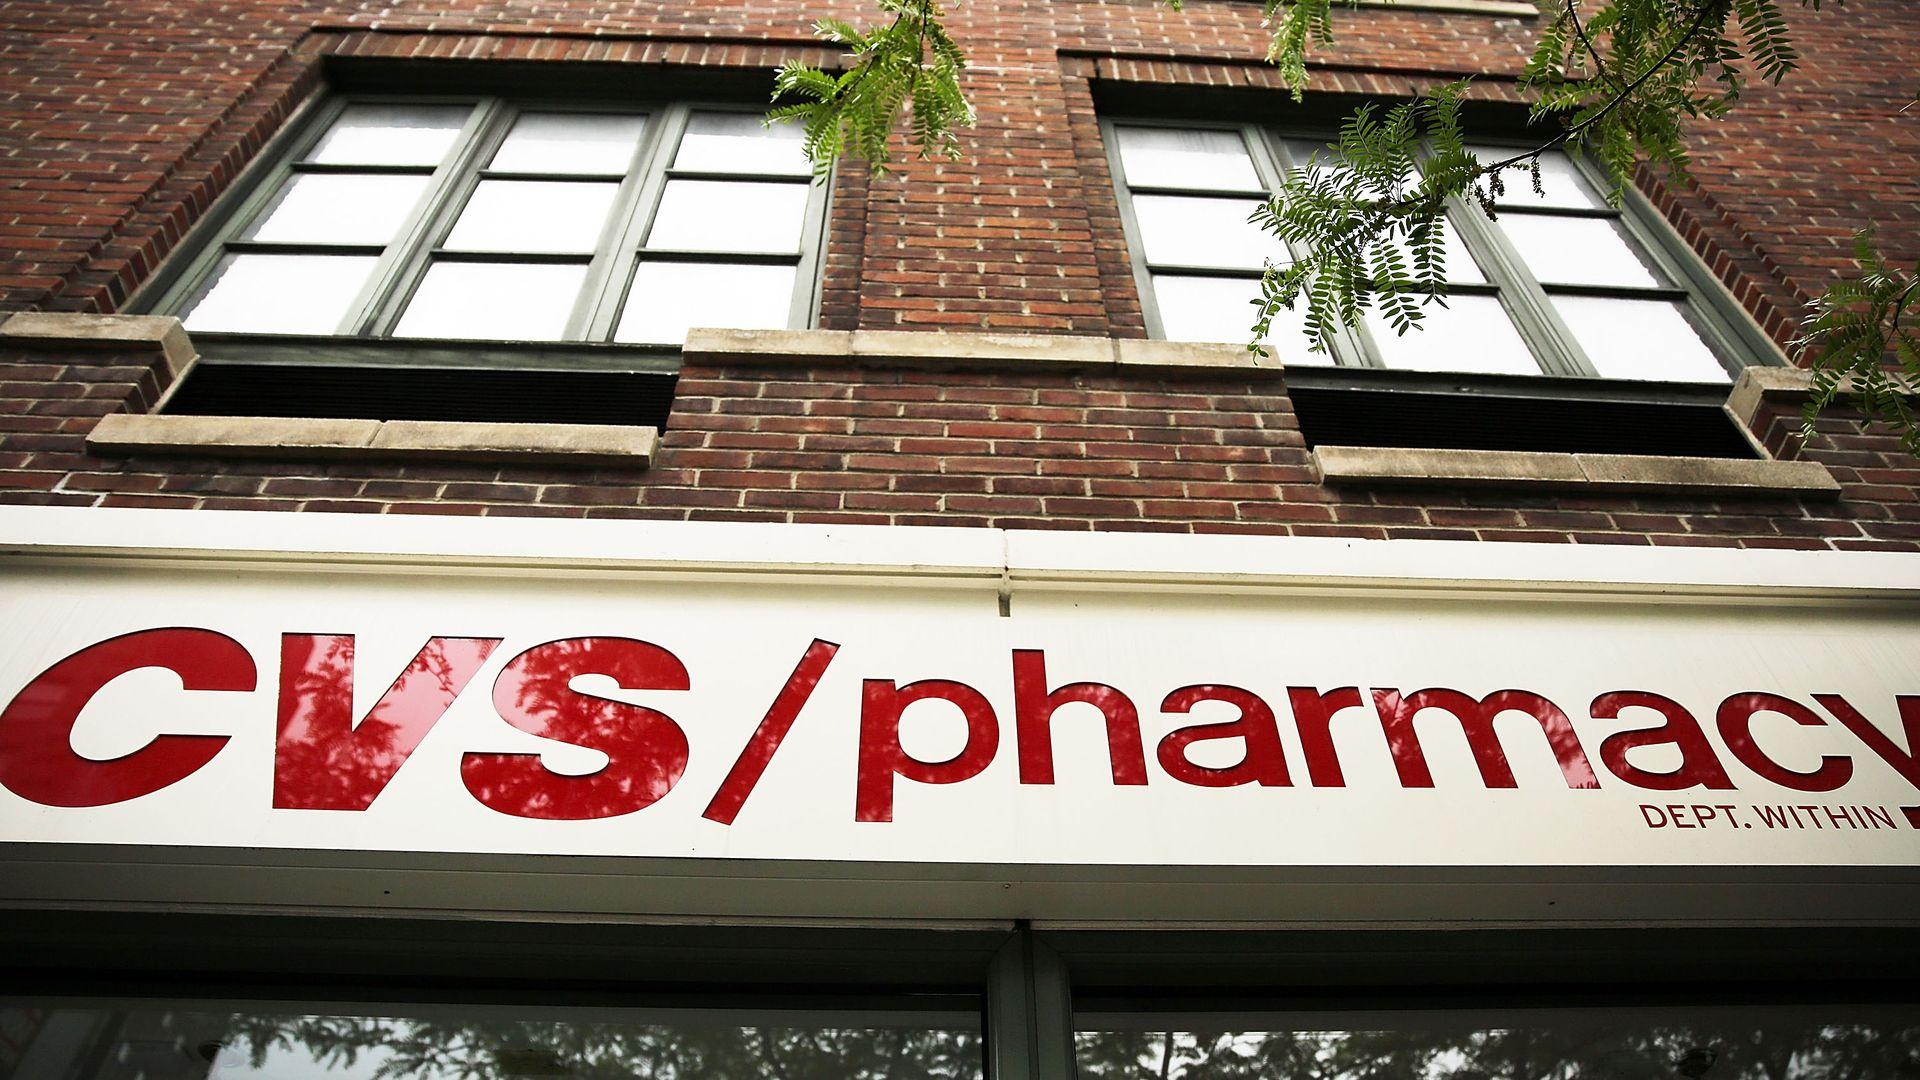 The CVS pharmacy logo on a storefront.